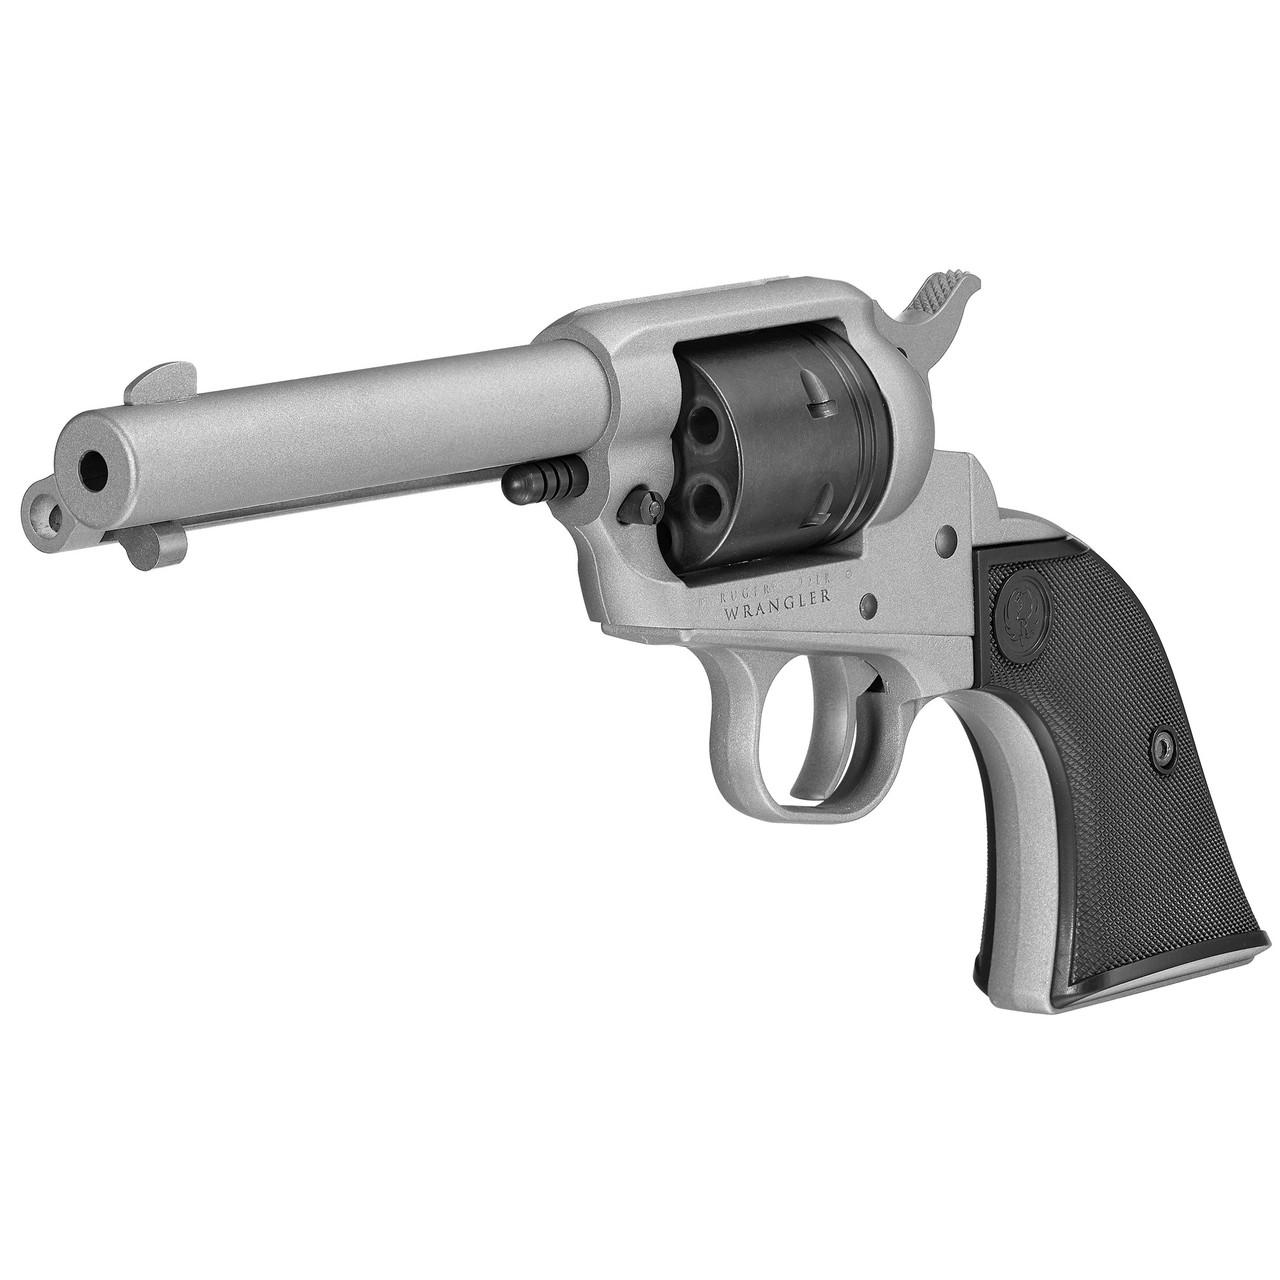 "Ruger 'Wrangle"" .22lr Single Action Revolver Silver"